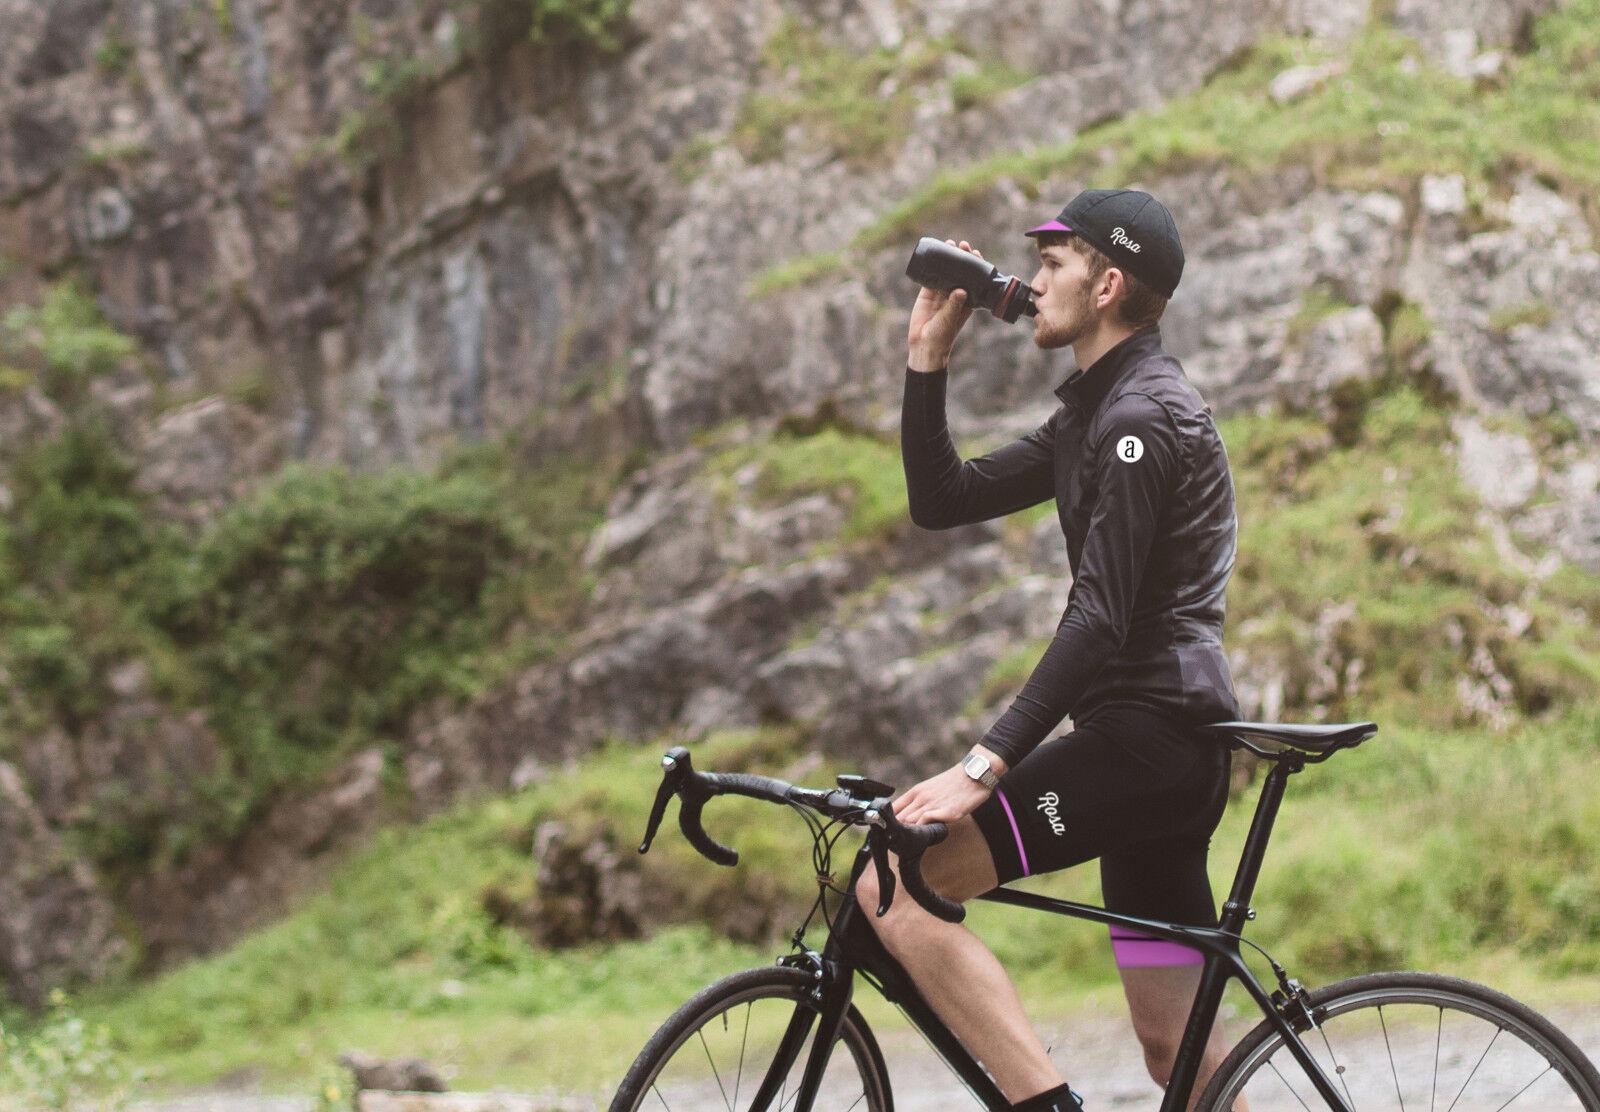 Applecross-CC 'Rosa' Cycling Cycling 'Rosa' Bib Shorts 43da2b